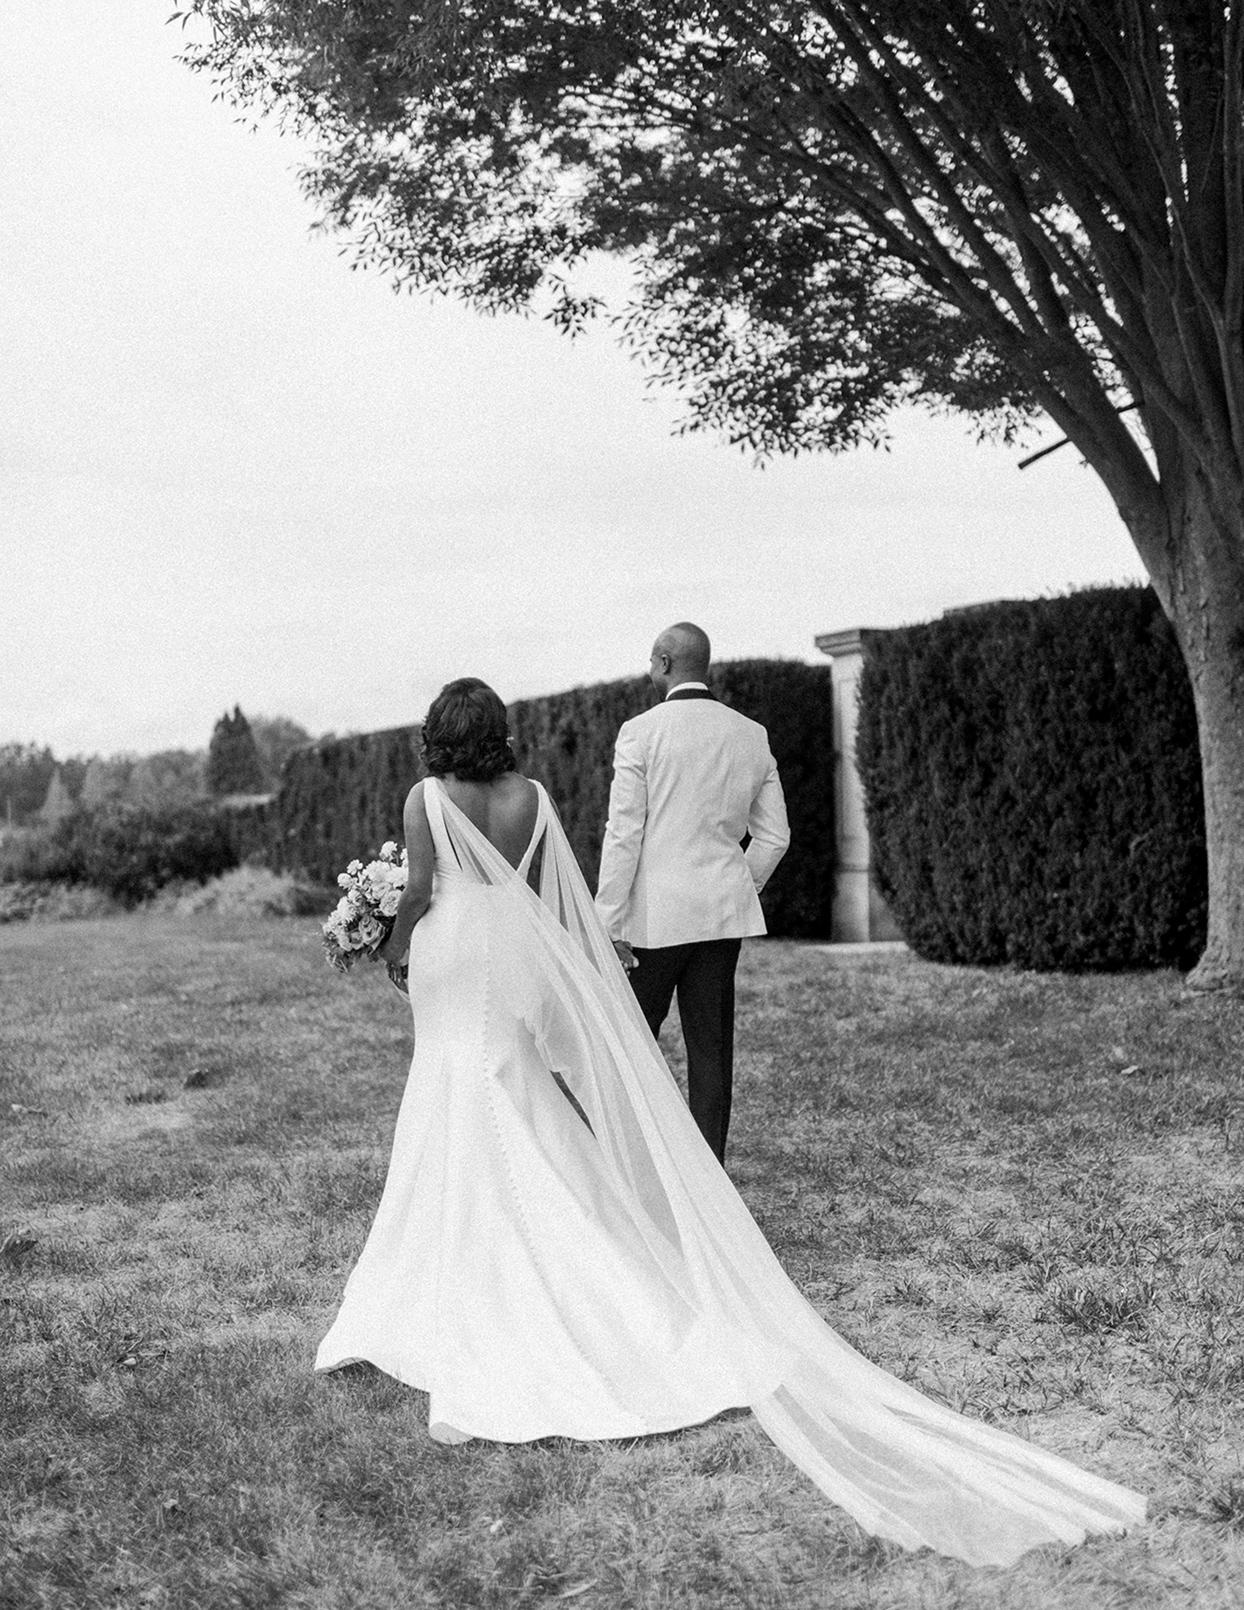 ericka meechaeyl wedding couple walking in garden